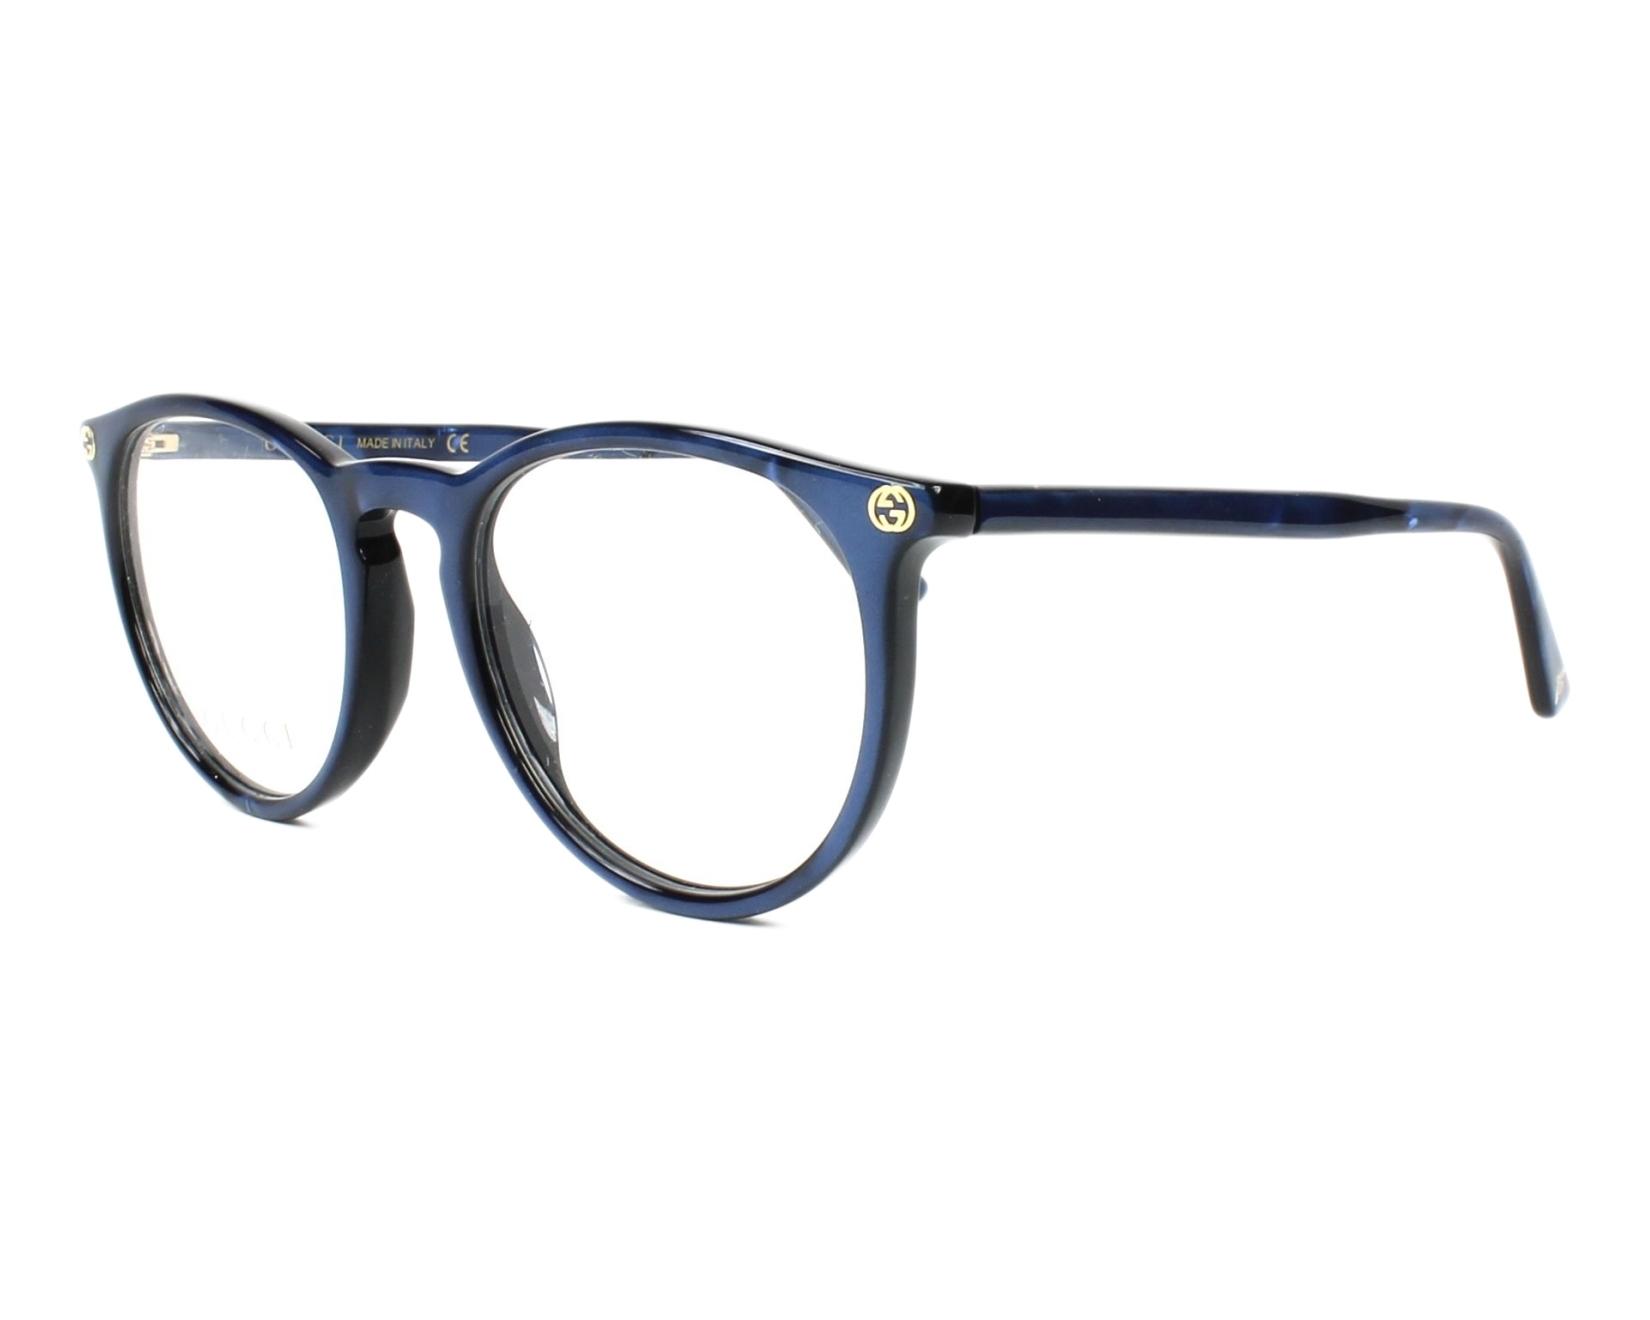 ebab18c15b7e4 Gafas graduadas gucci azul vista de perfil jpg 1650x1320 Lentes gucci para  mujer